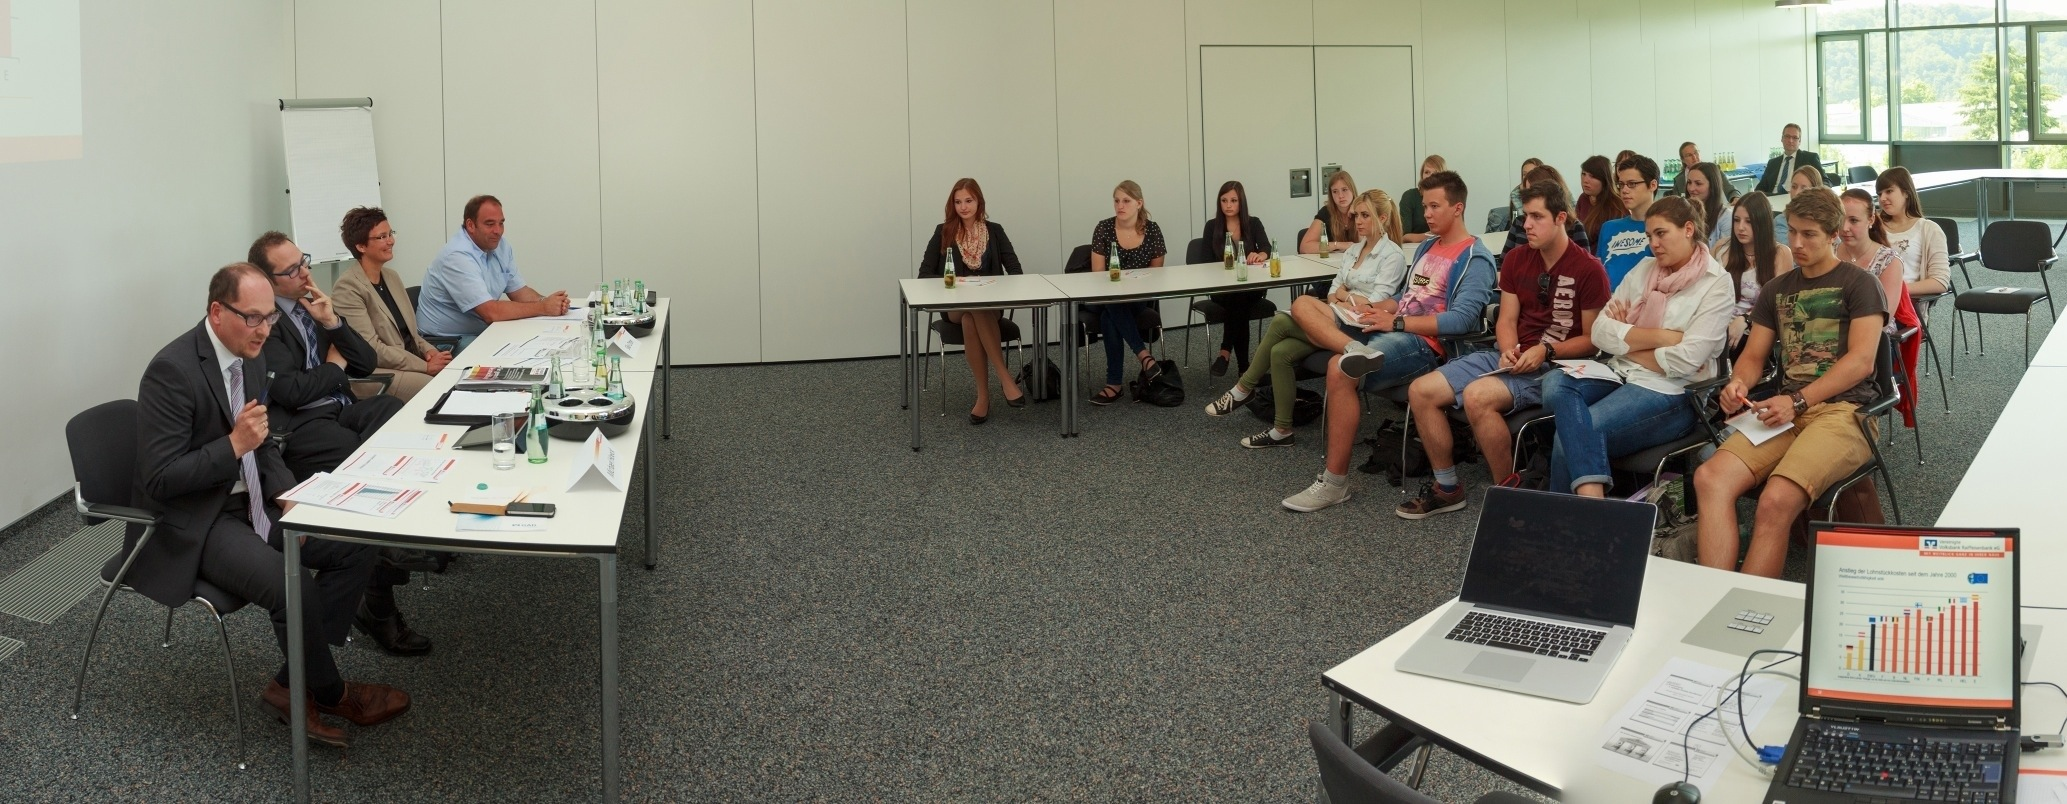 Schuelerpressekonferenz1